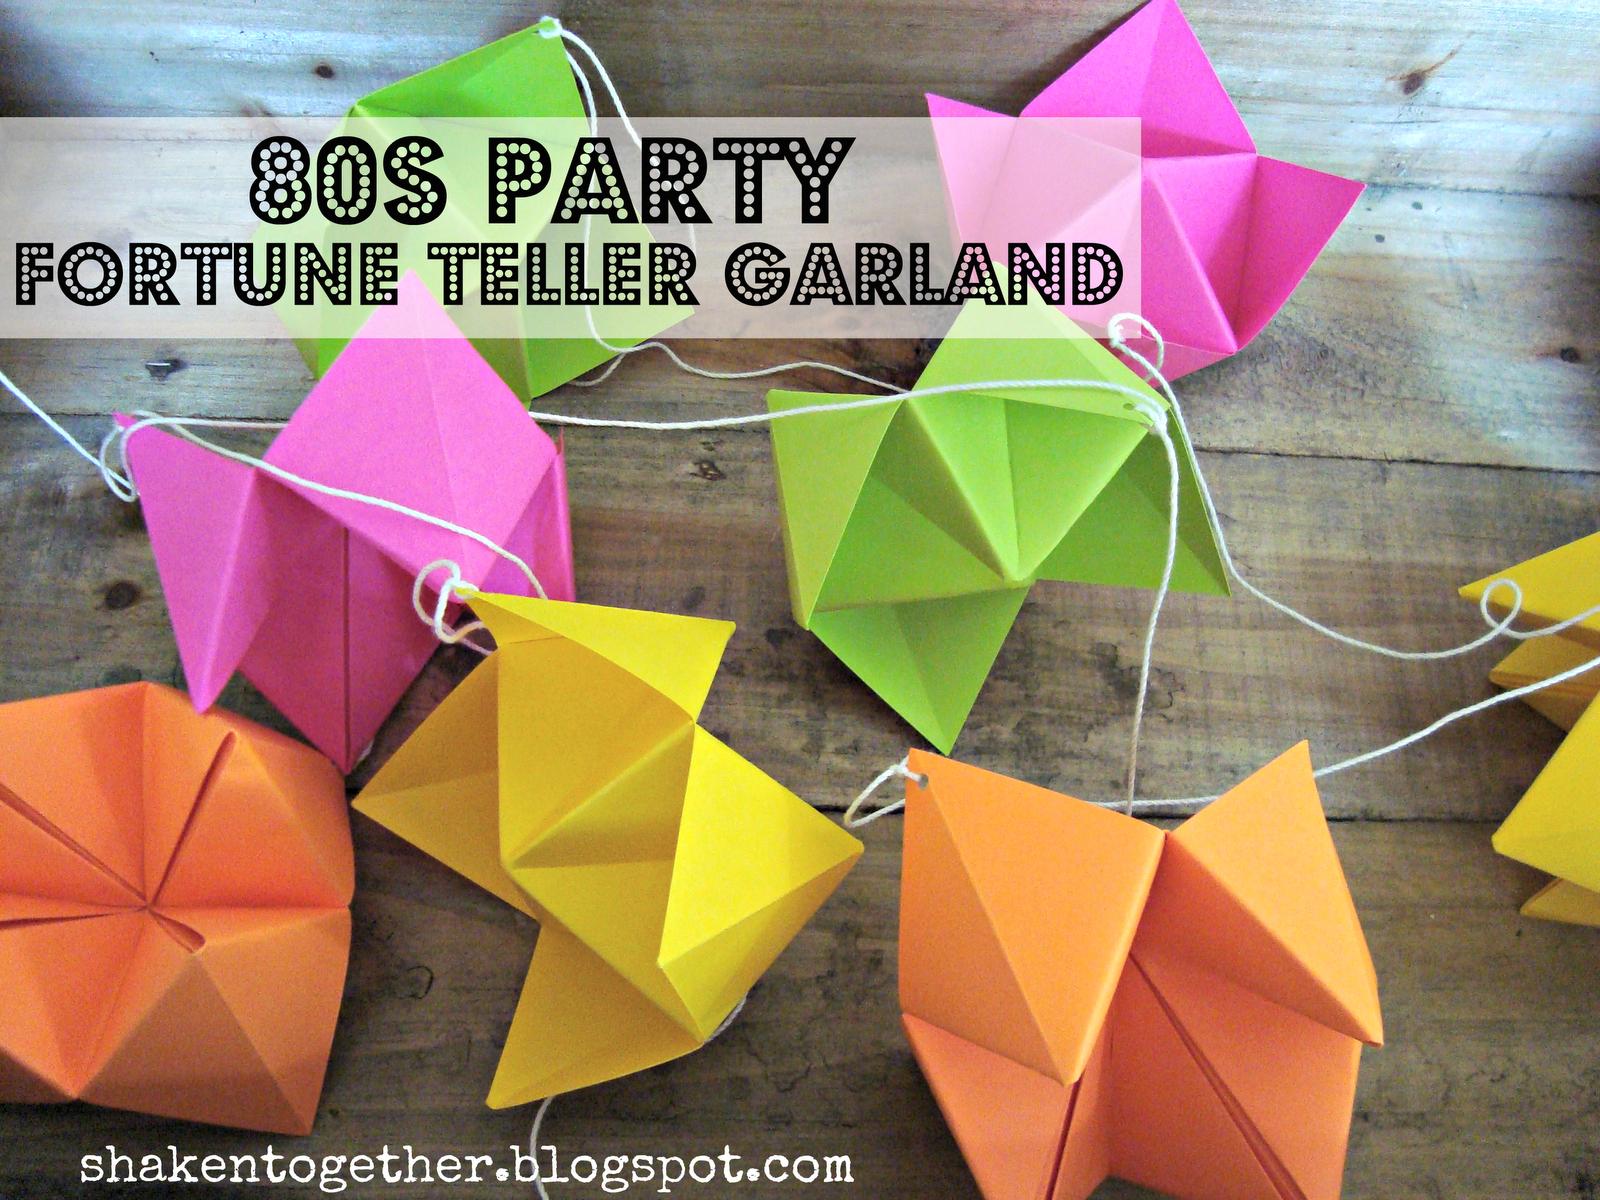 Best 25+ 80s decorations ideas on Pinterest | 80s party, 1980s ...